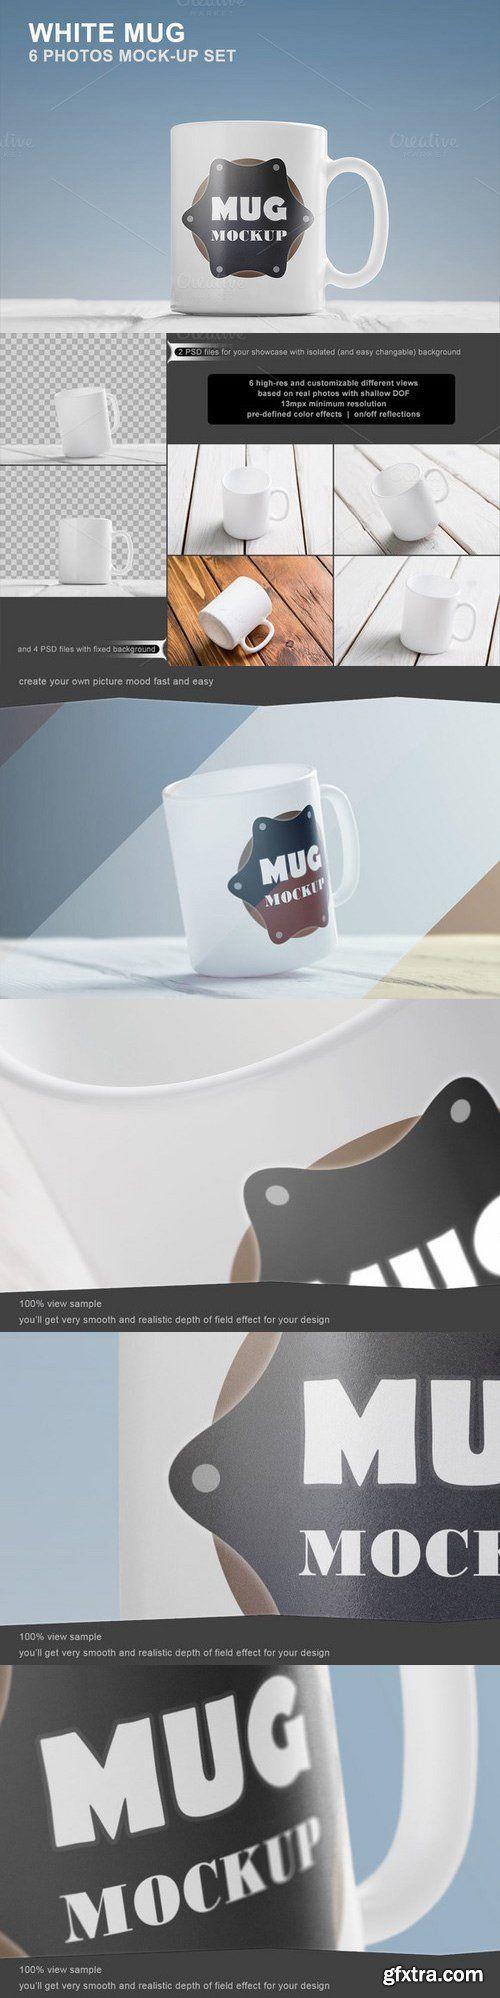 CM - White Mug Mockup Set - 6 photos 586065